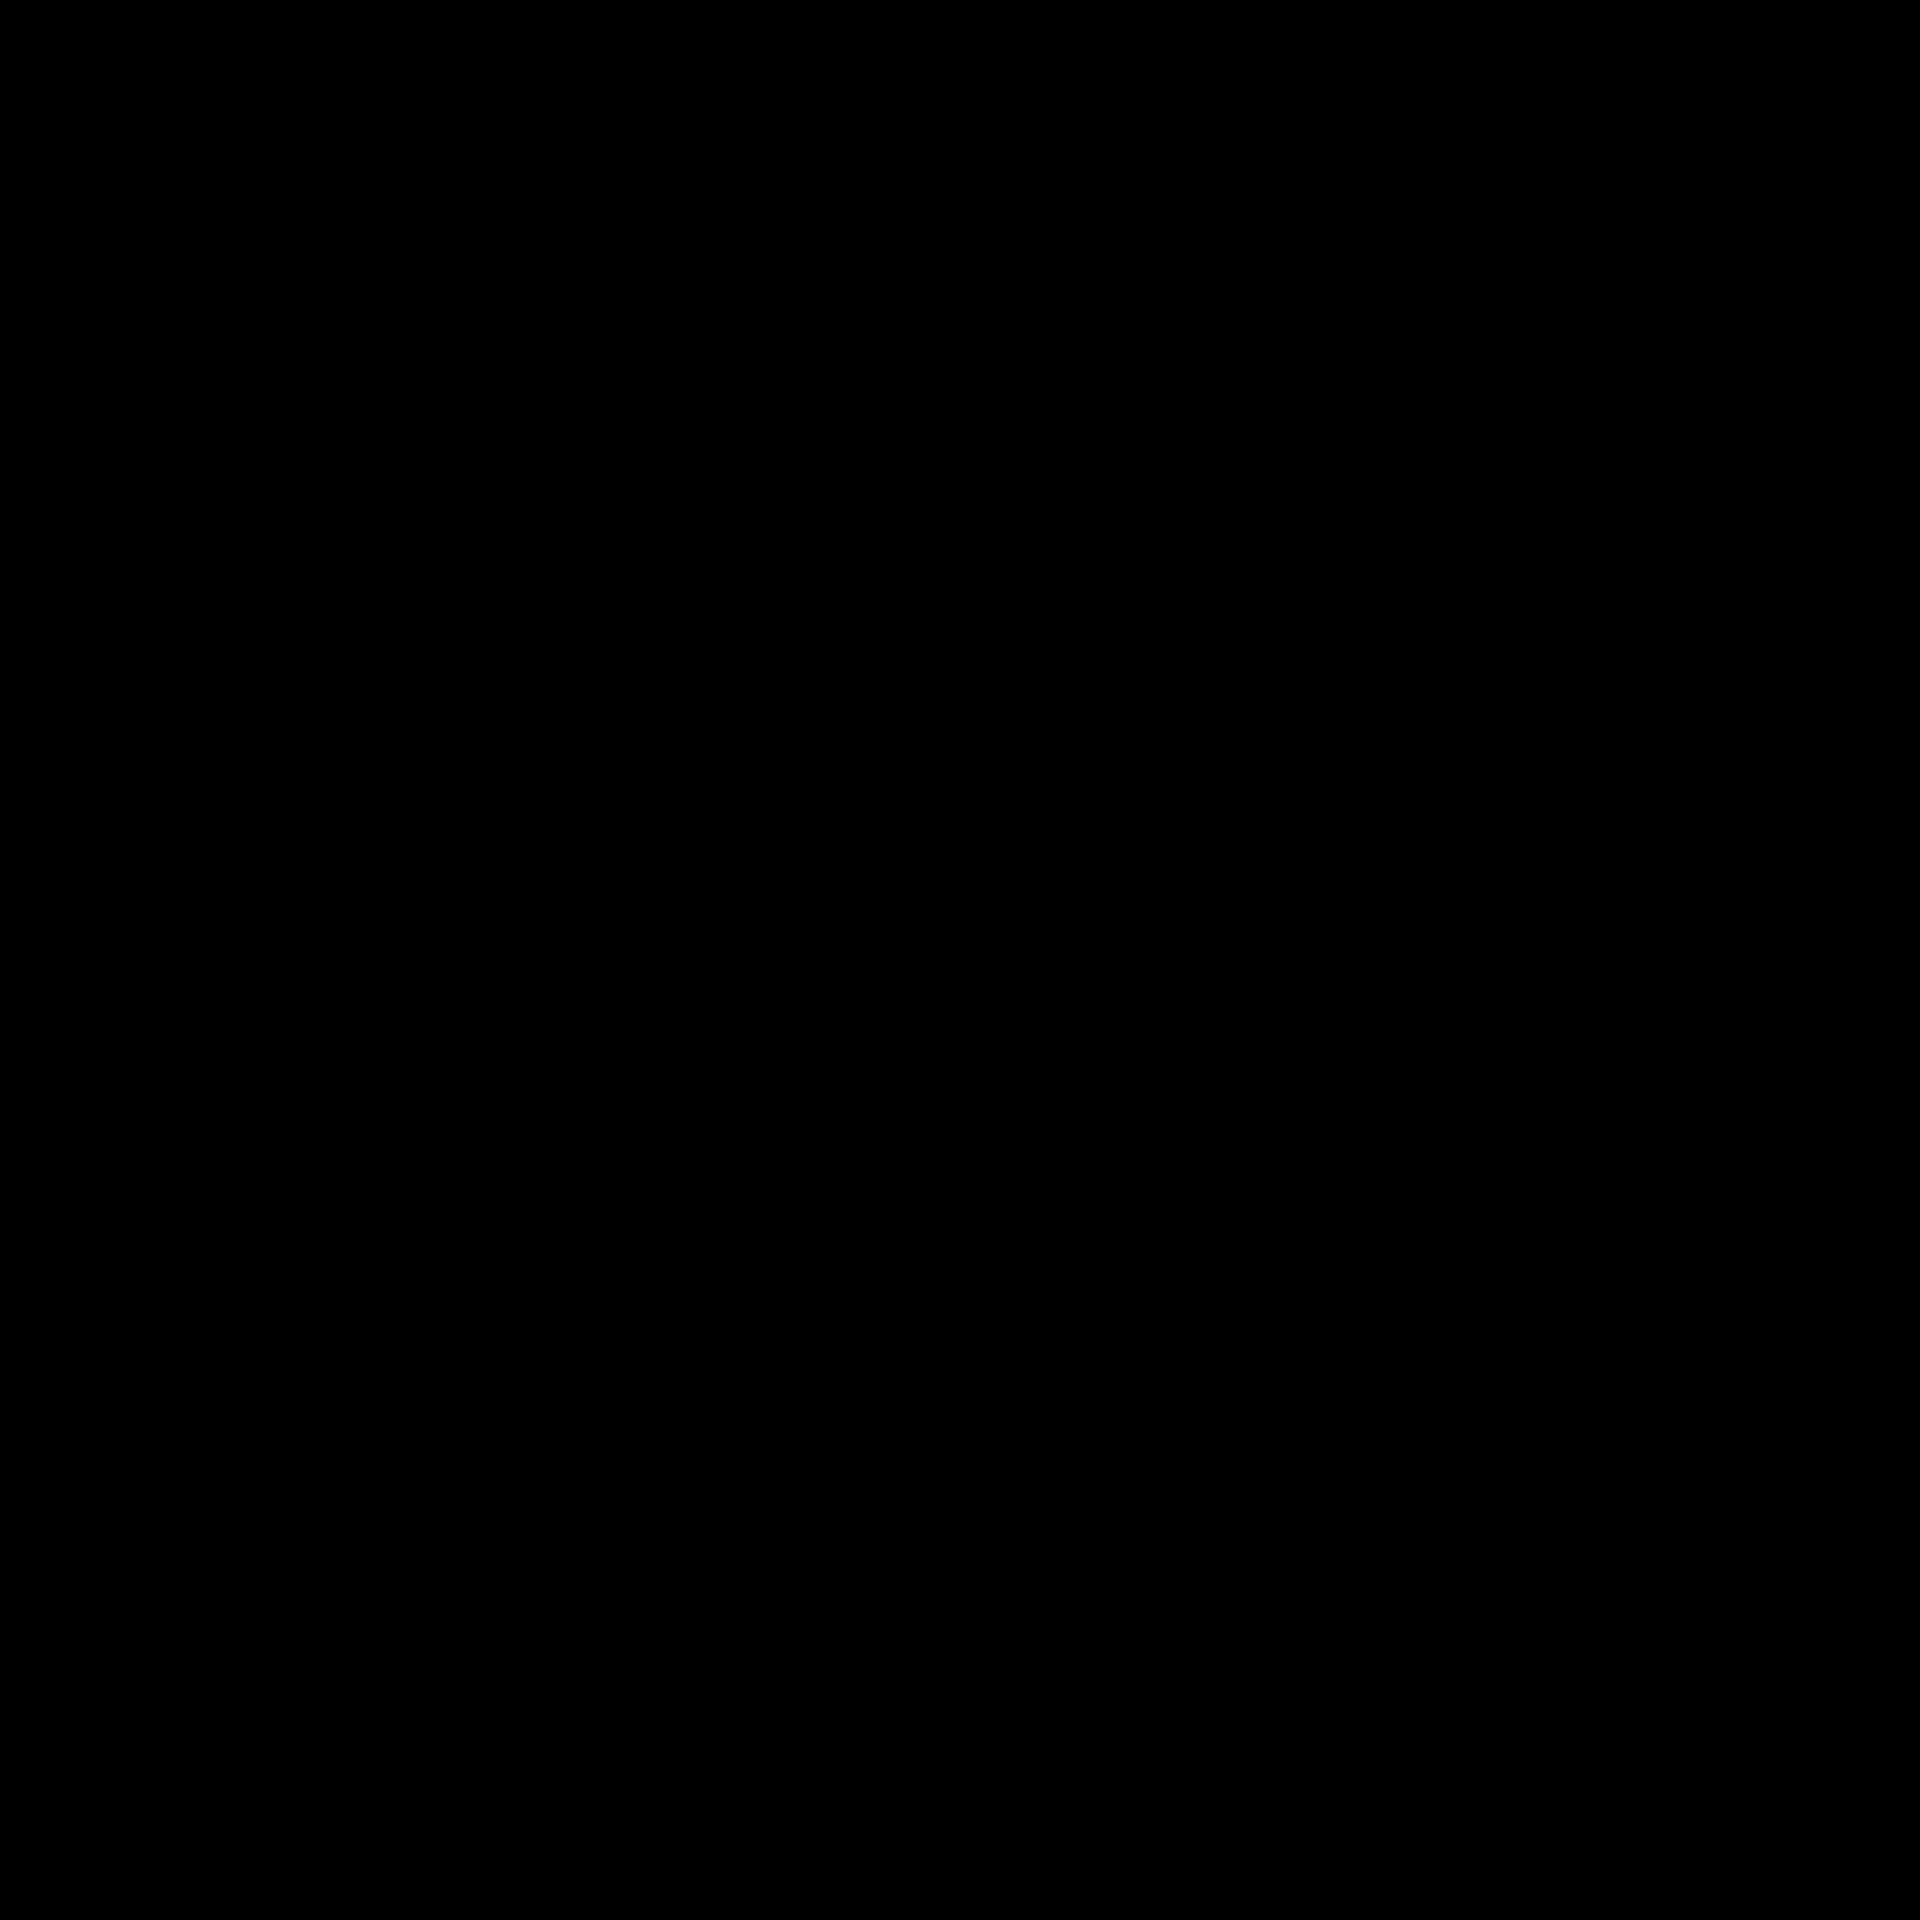 https://eqoxdgod6do.exactdn.com/wp-content/uploads/2021/02/AdobeStock_190879087-scaled.jpeg?strip=all&lossy=1&w=1920&ssl=1